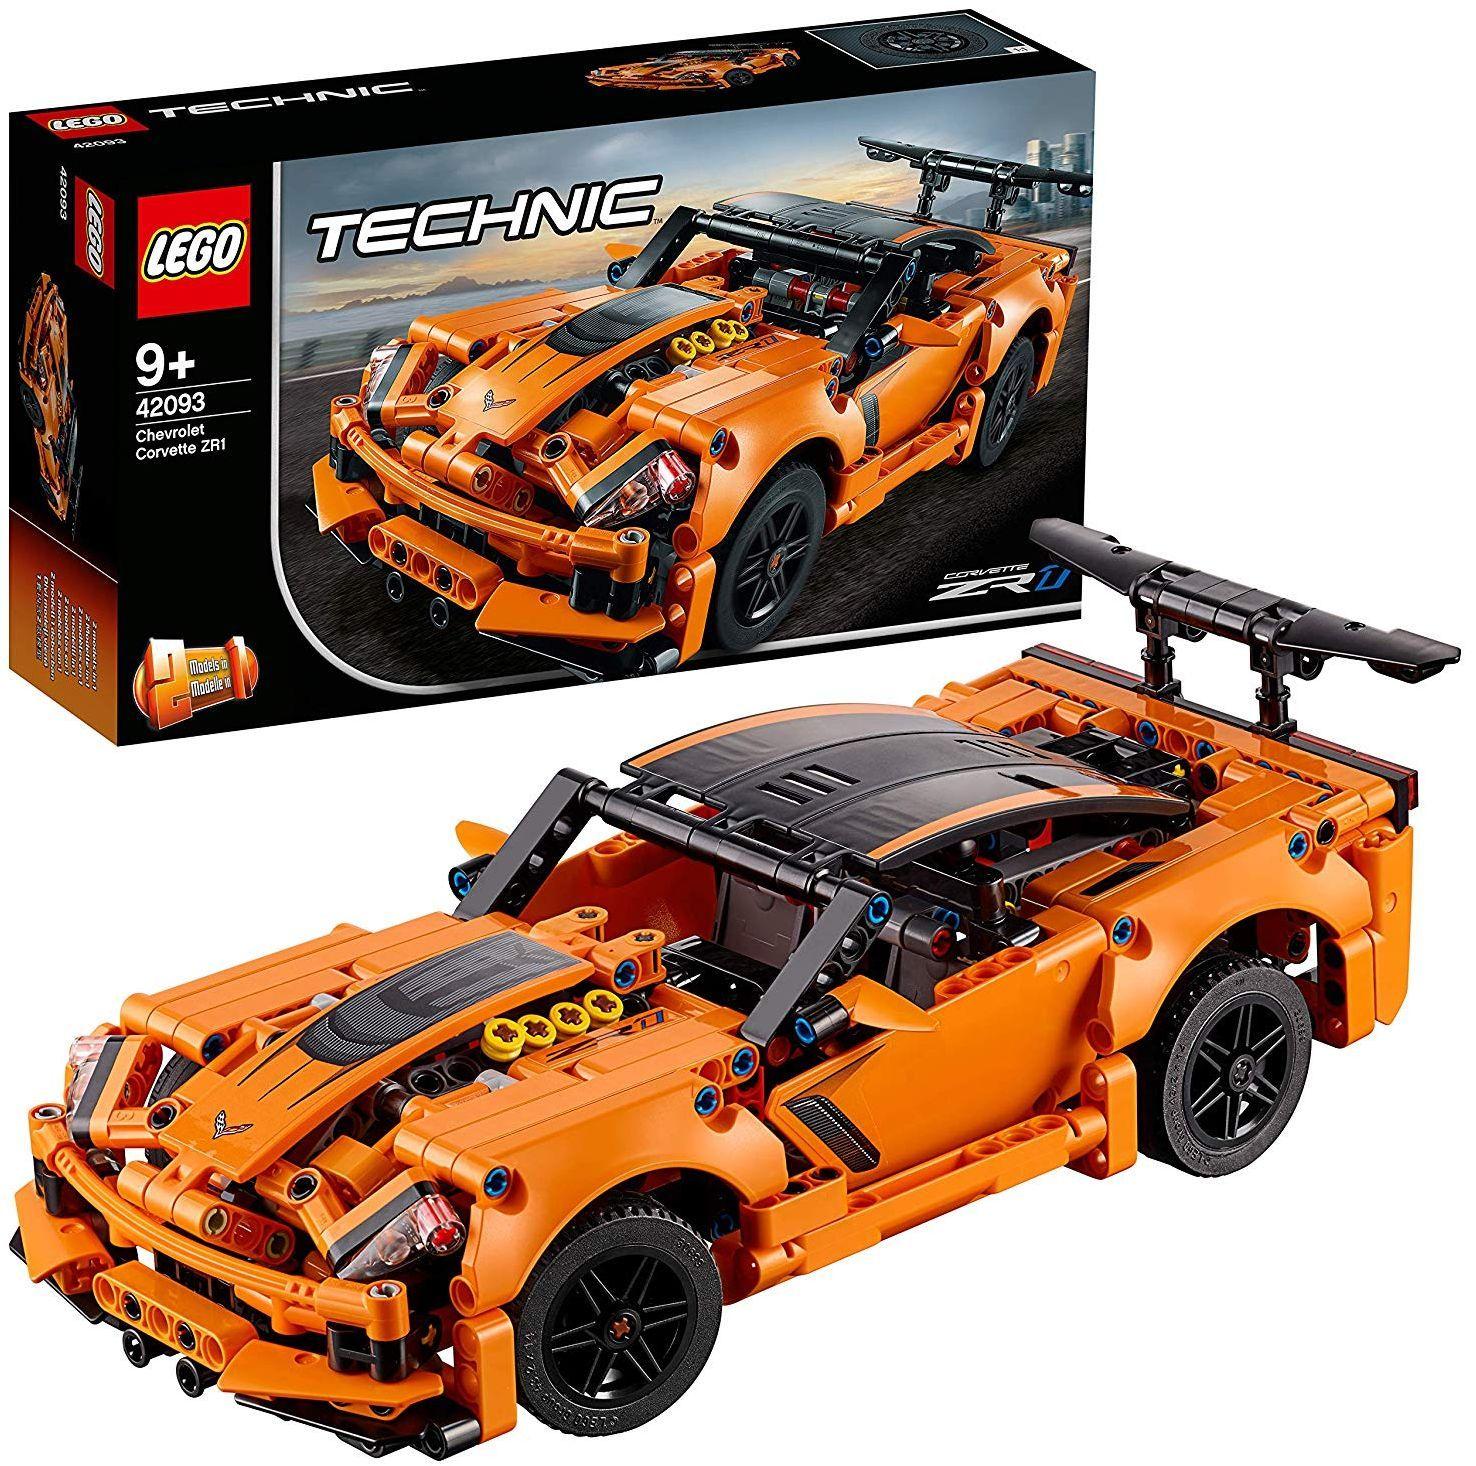 Конструктор Lego Technic - Chevrolet Corvette ZR1 (42093) - 6